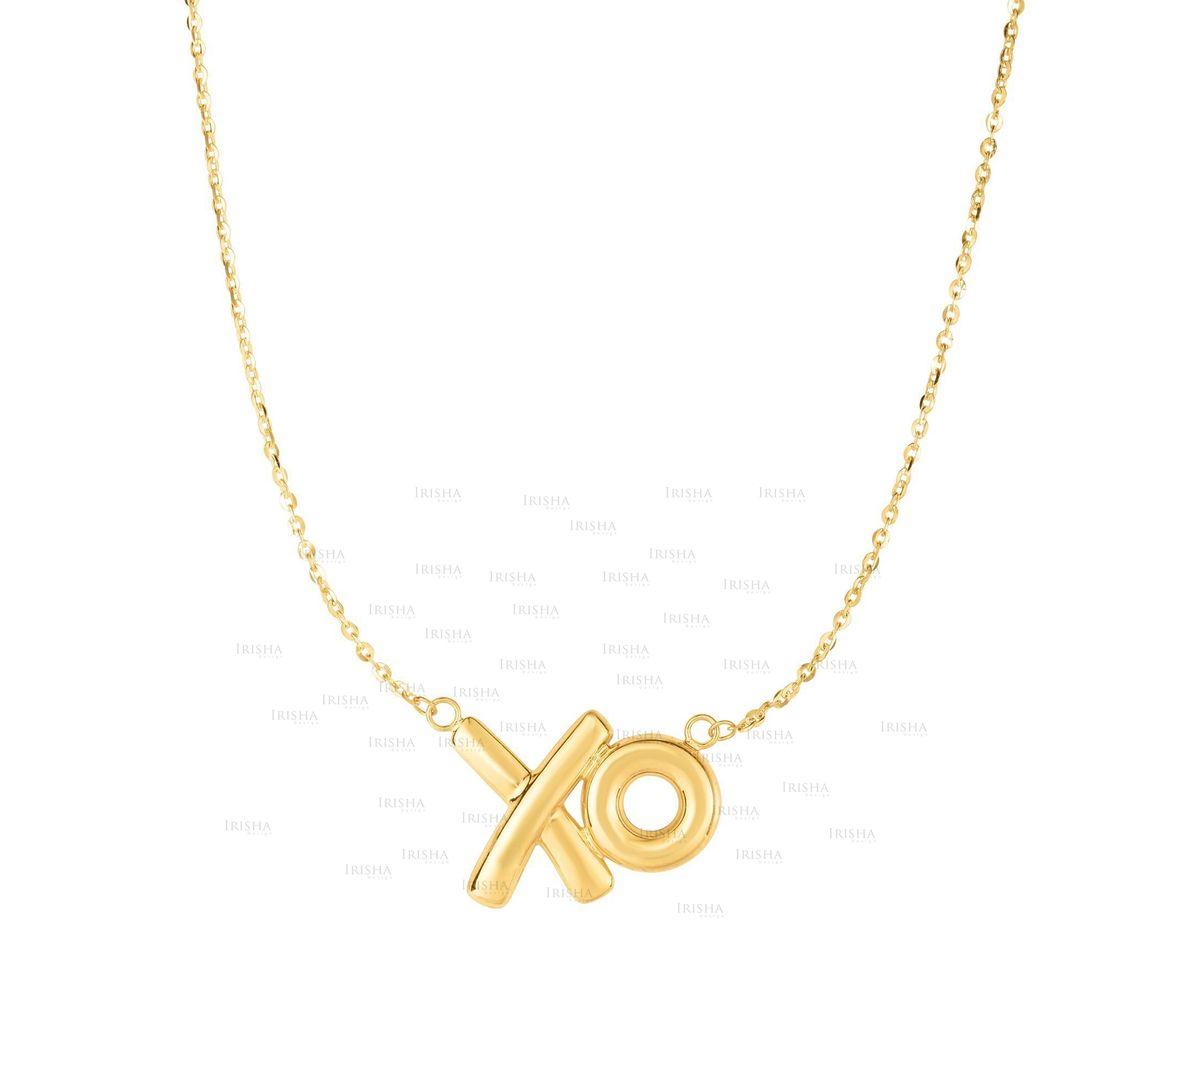 14K Yellow Gold 20x13mm Shiny XO Charm Necklace with 18'' Chain Fine Jewelry